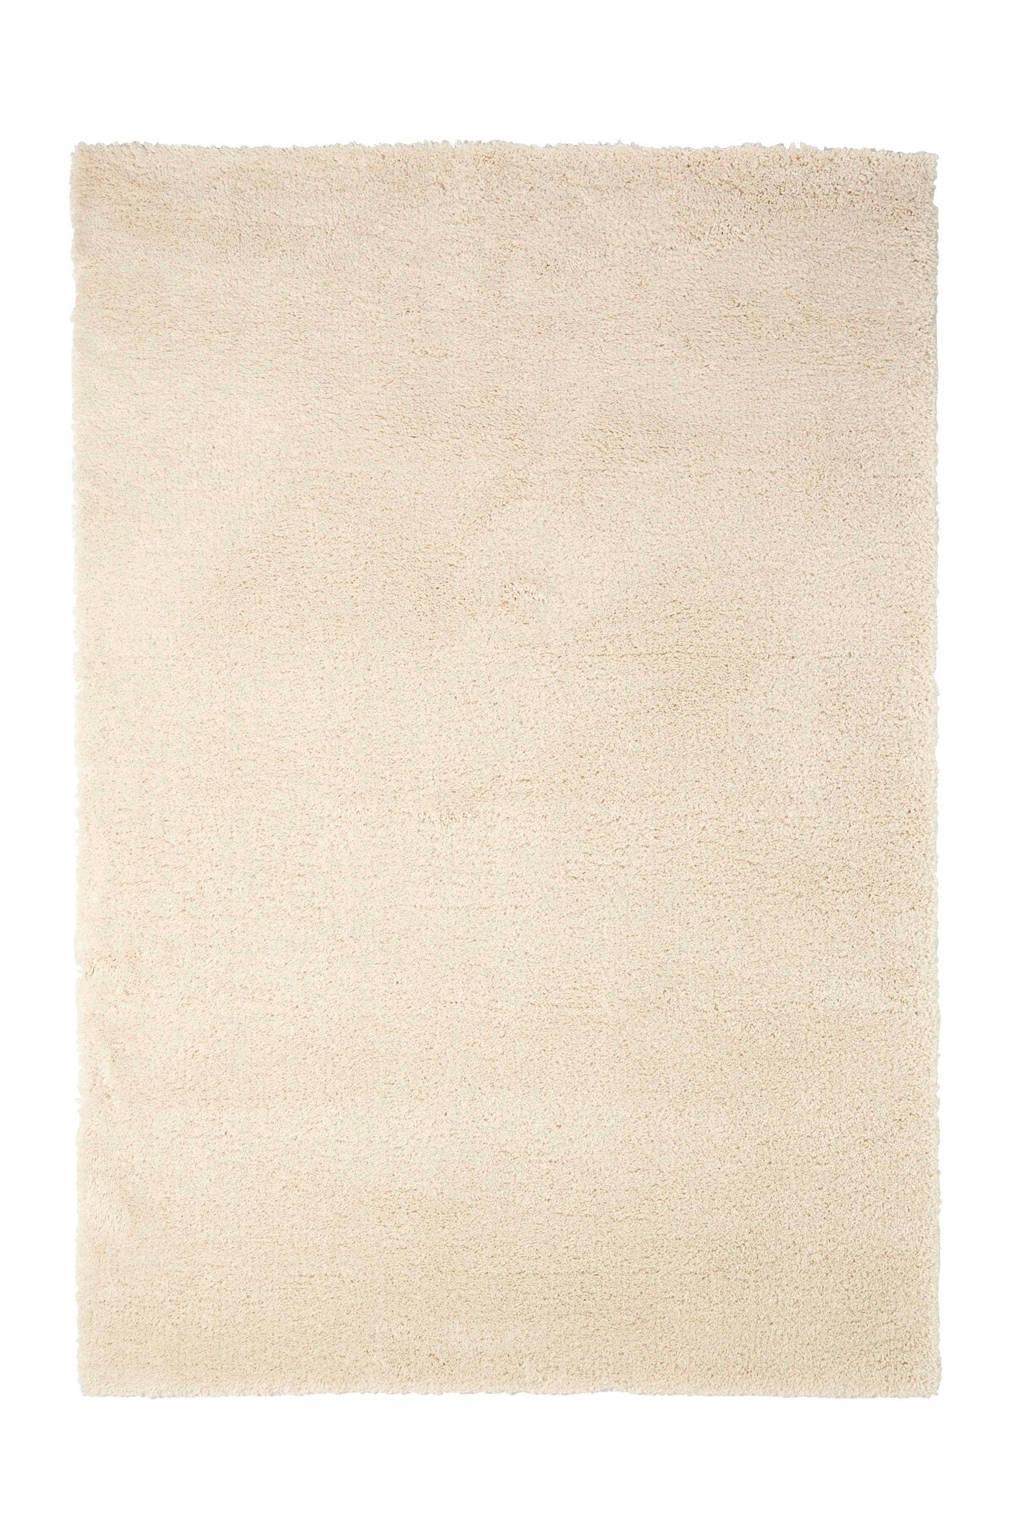 whkmp's own Vloerkleed  (190x135 cm), Wit